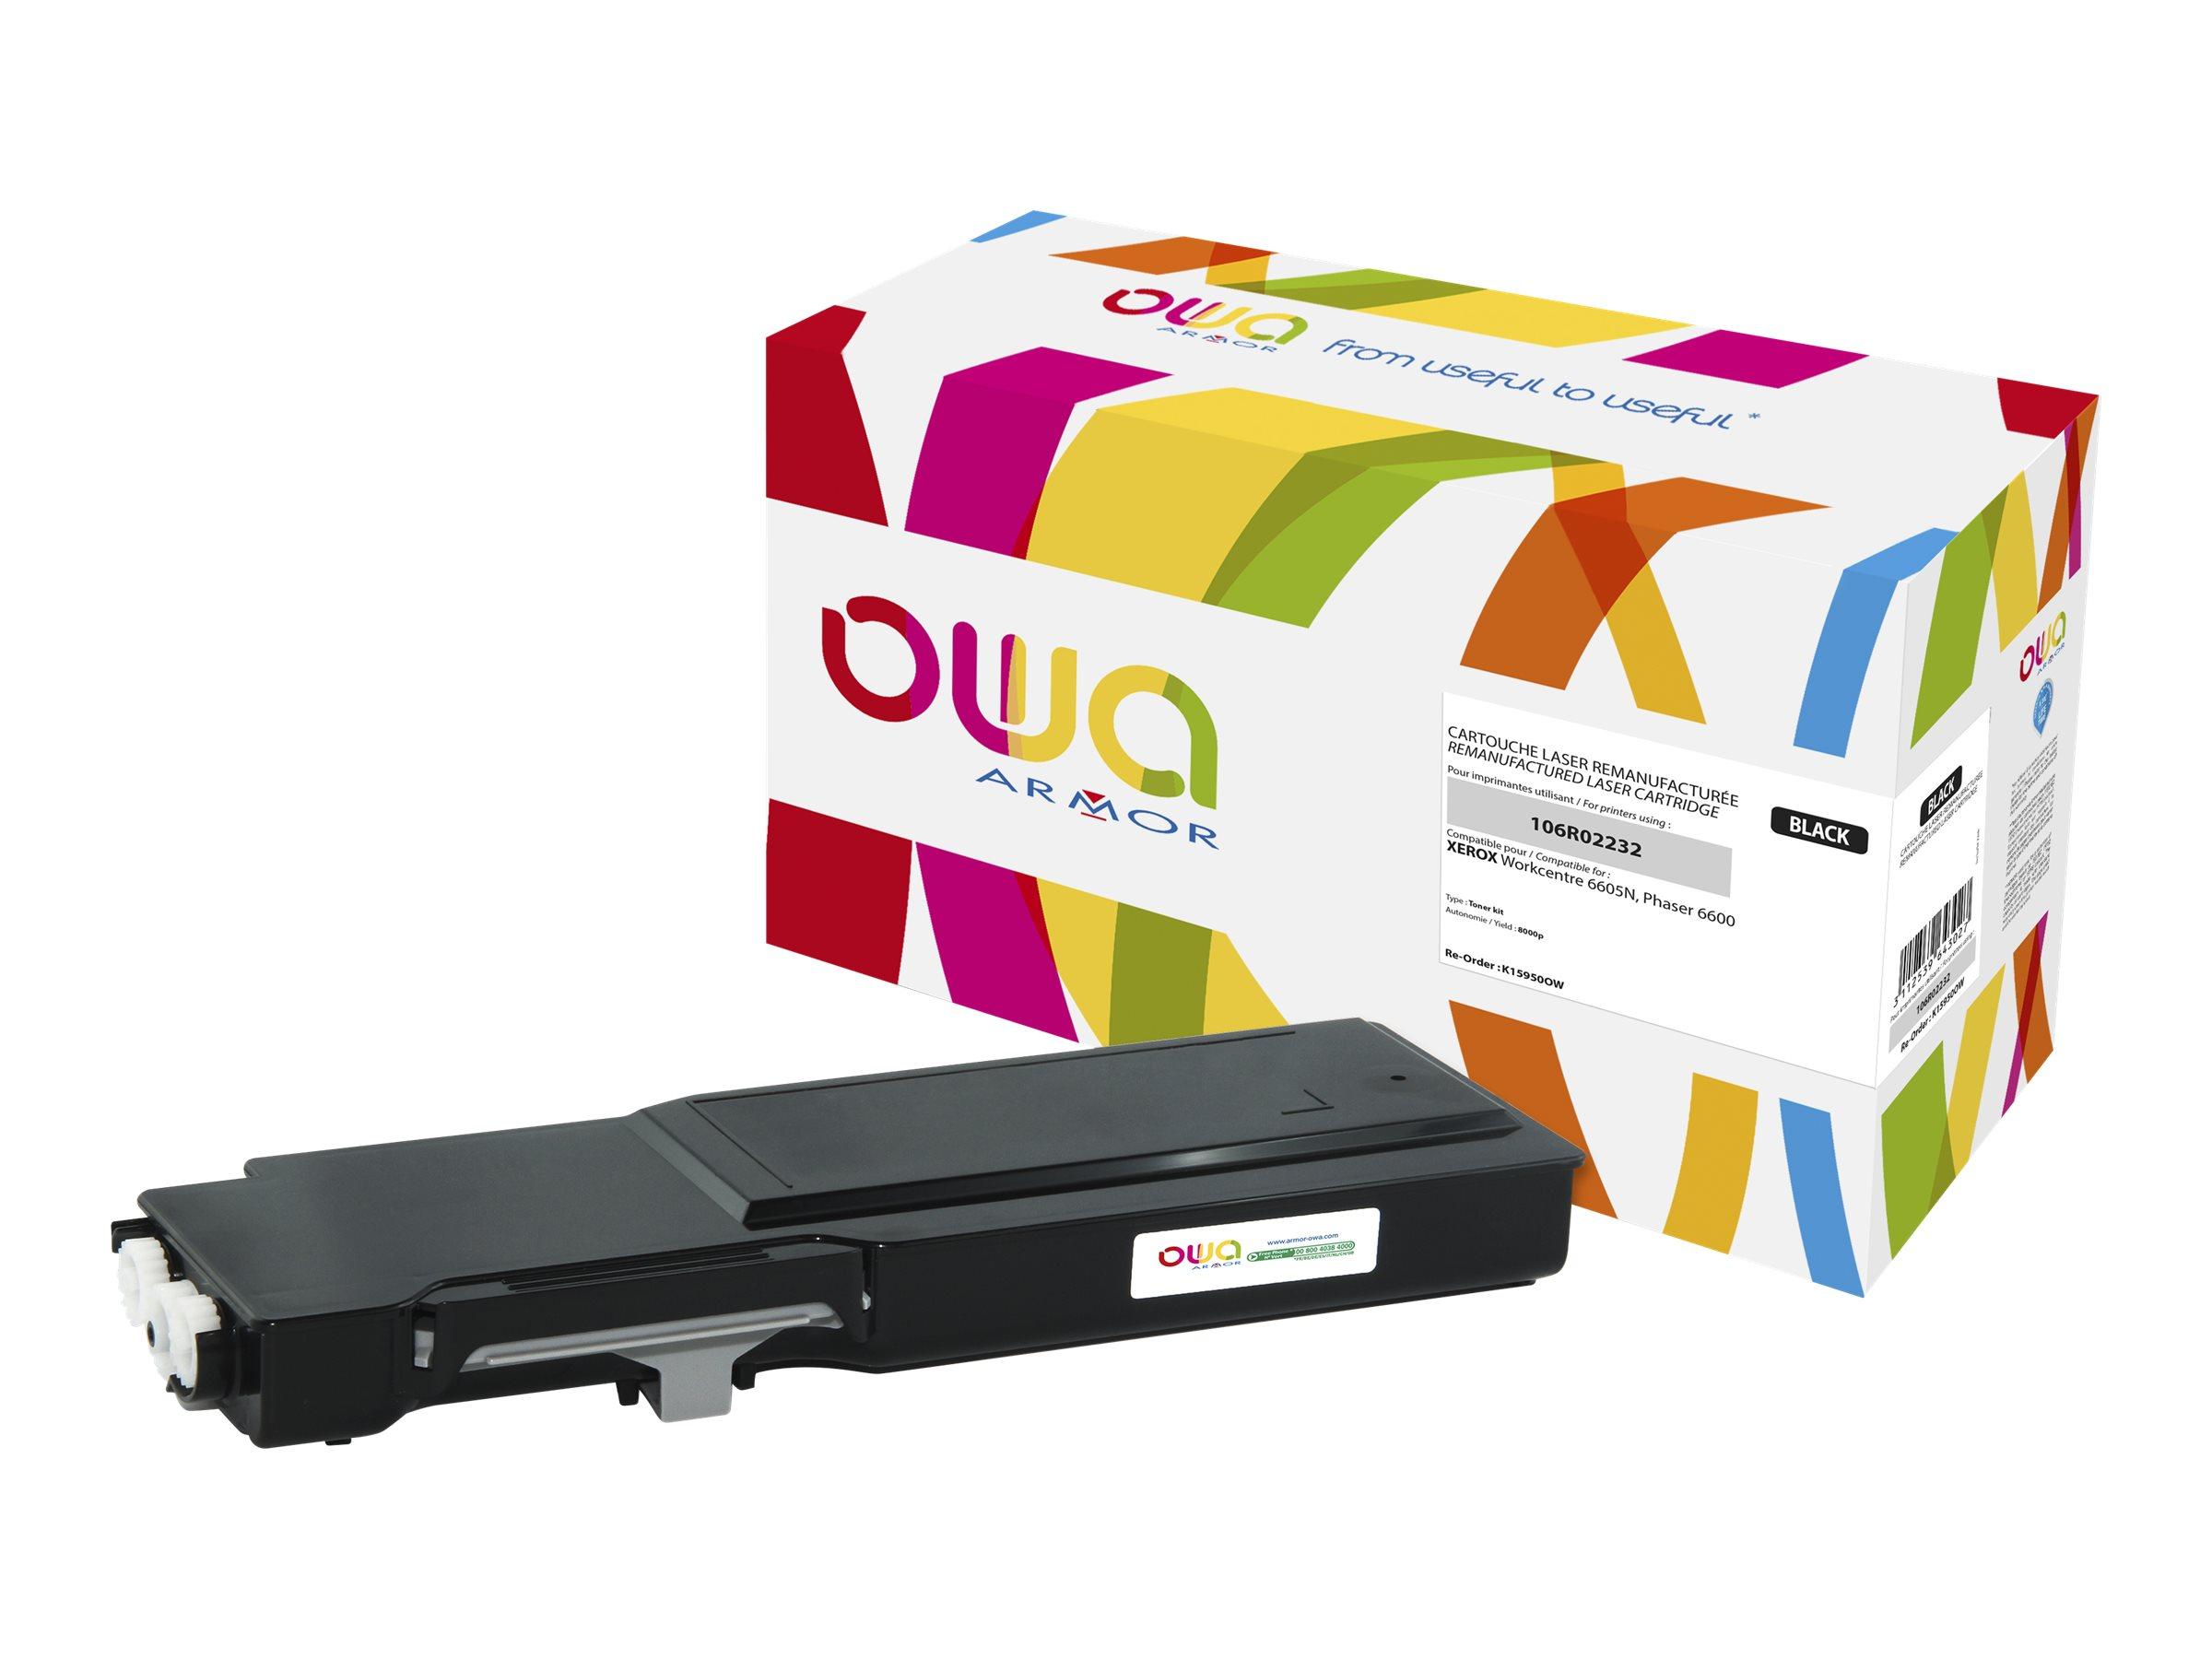 Xerox 106R02232 - remanufacturé OWA K15950OW - noir - cartouche laser